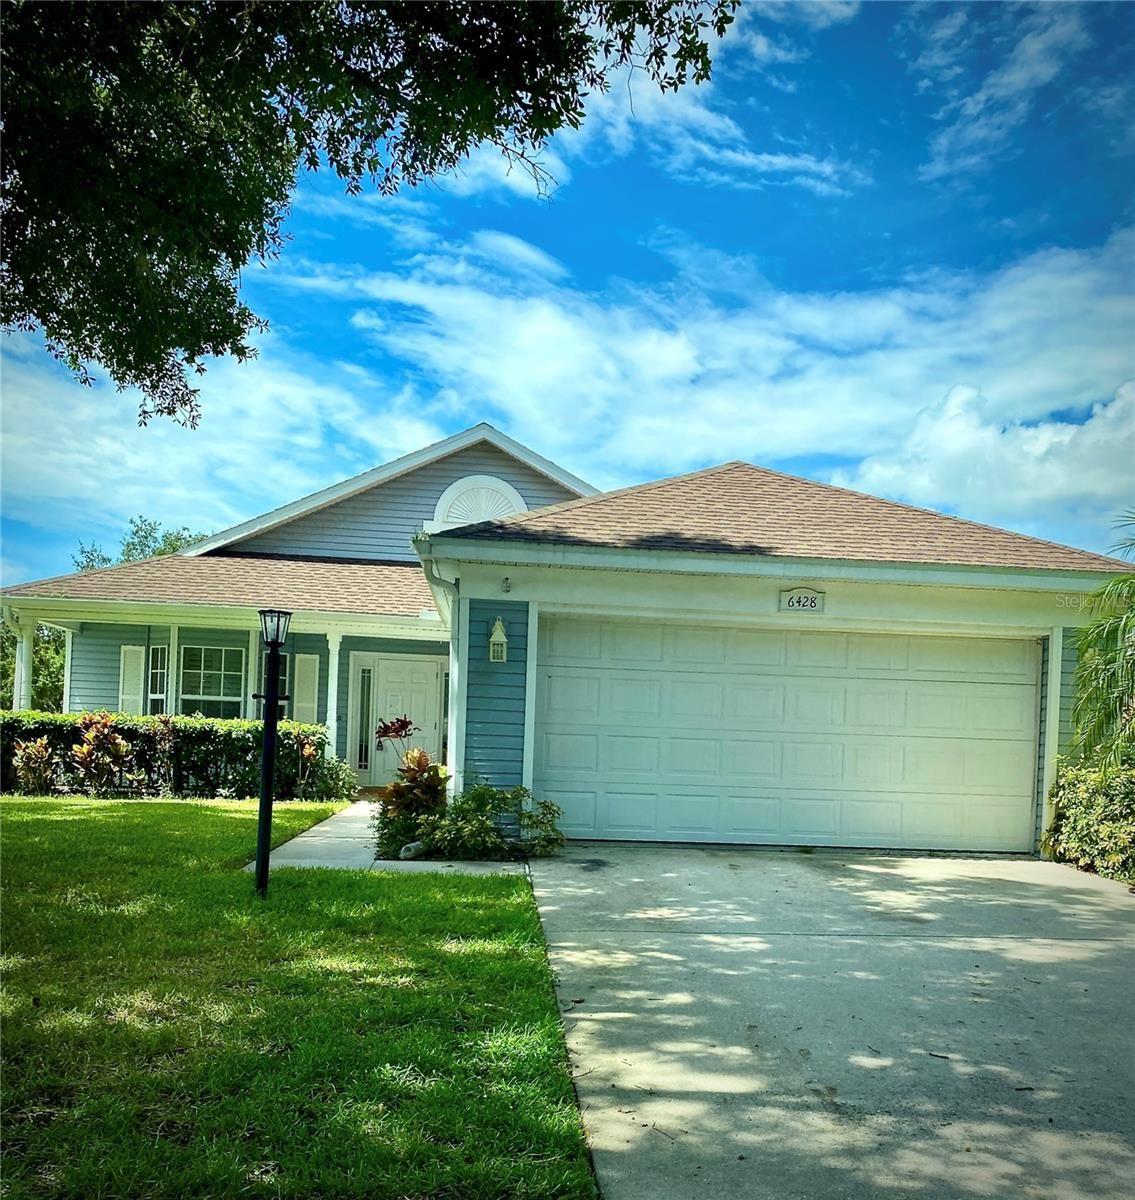 6428 HUCKLEBERRY LANE, Lakewood Ranch, FL 34202 - #: O5974725